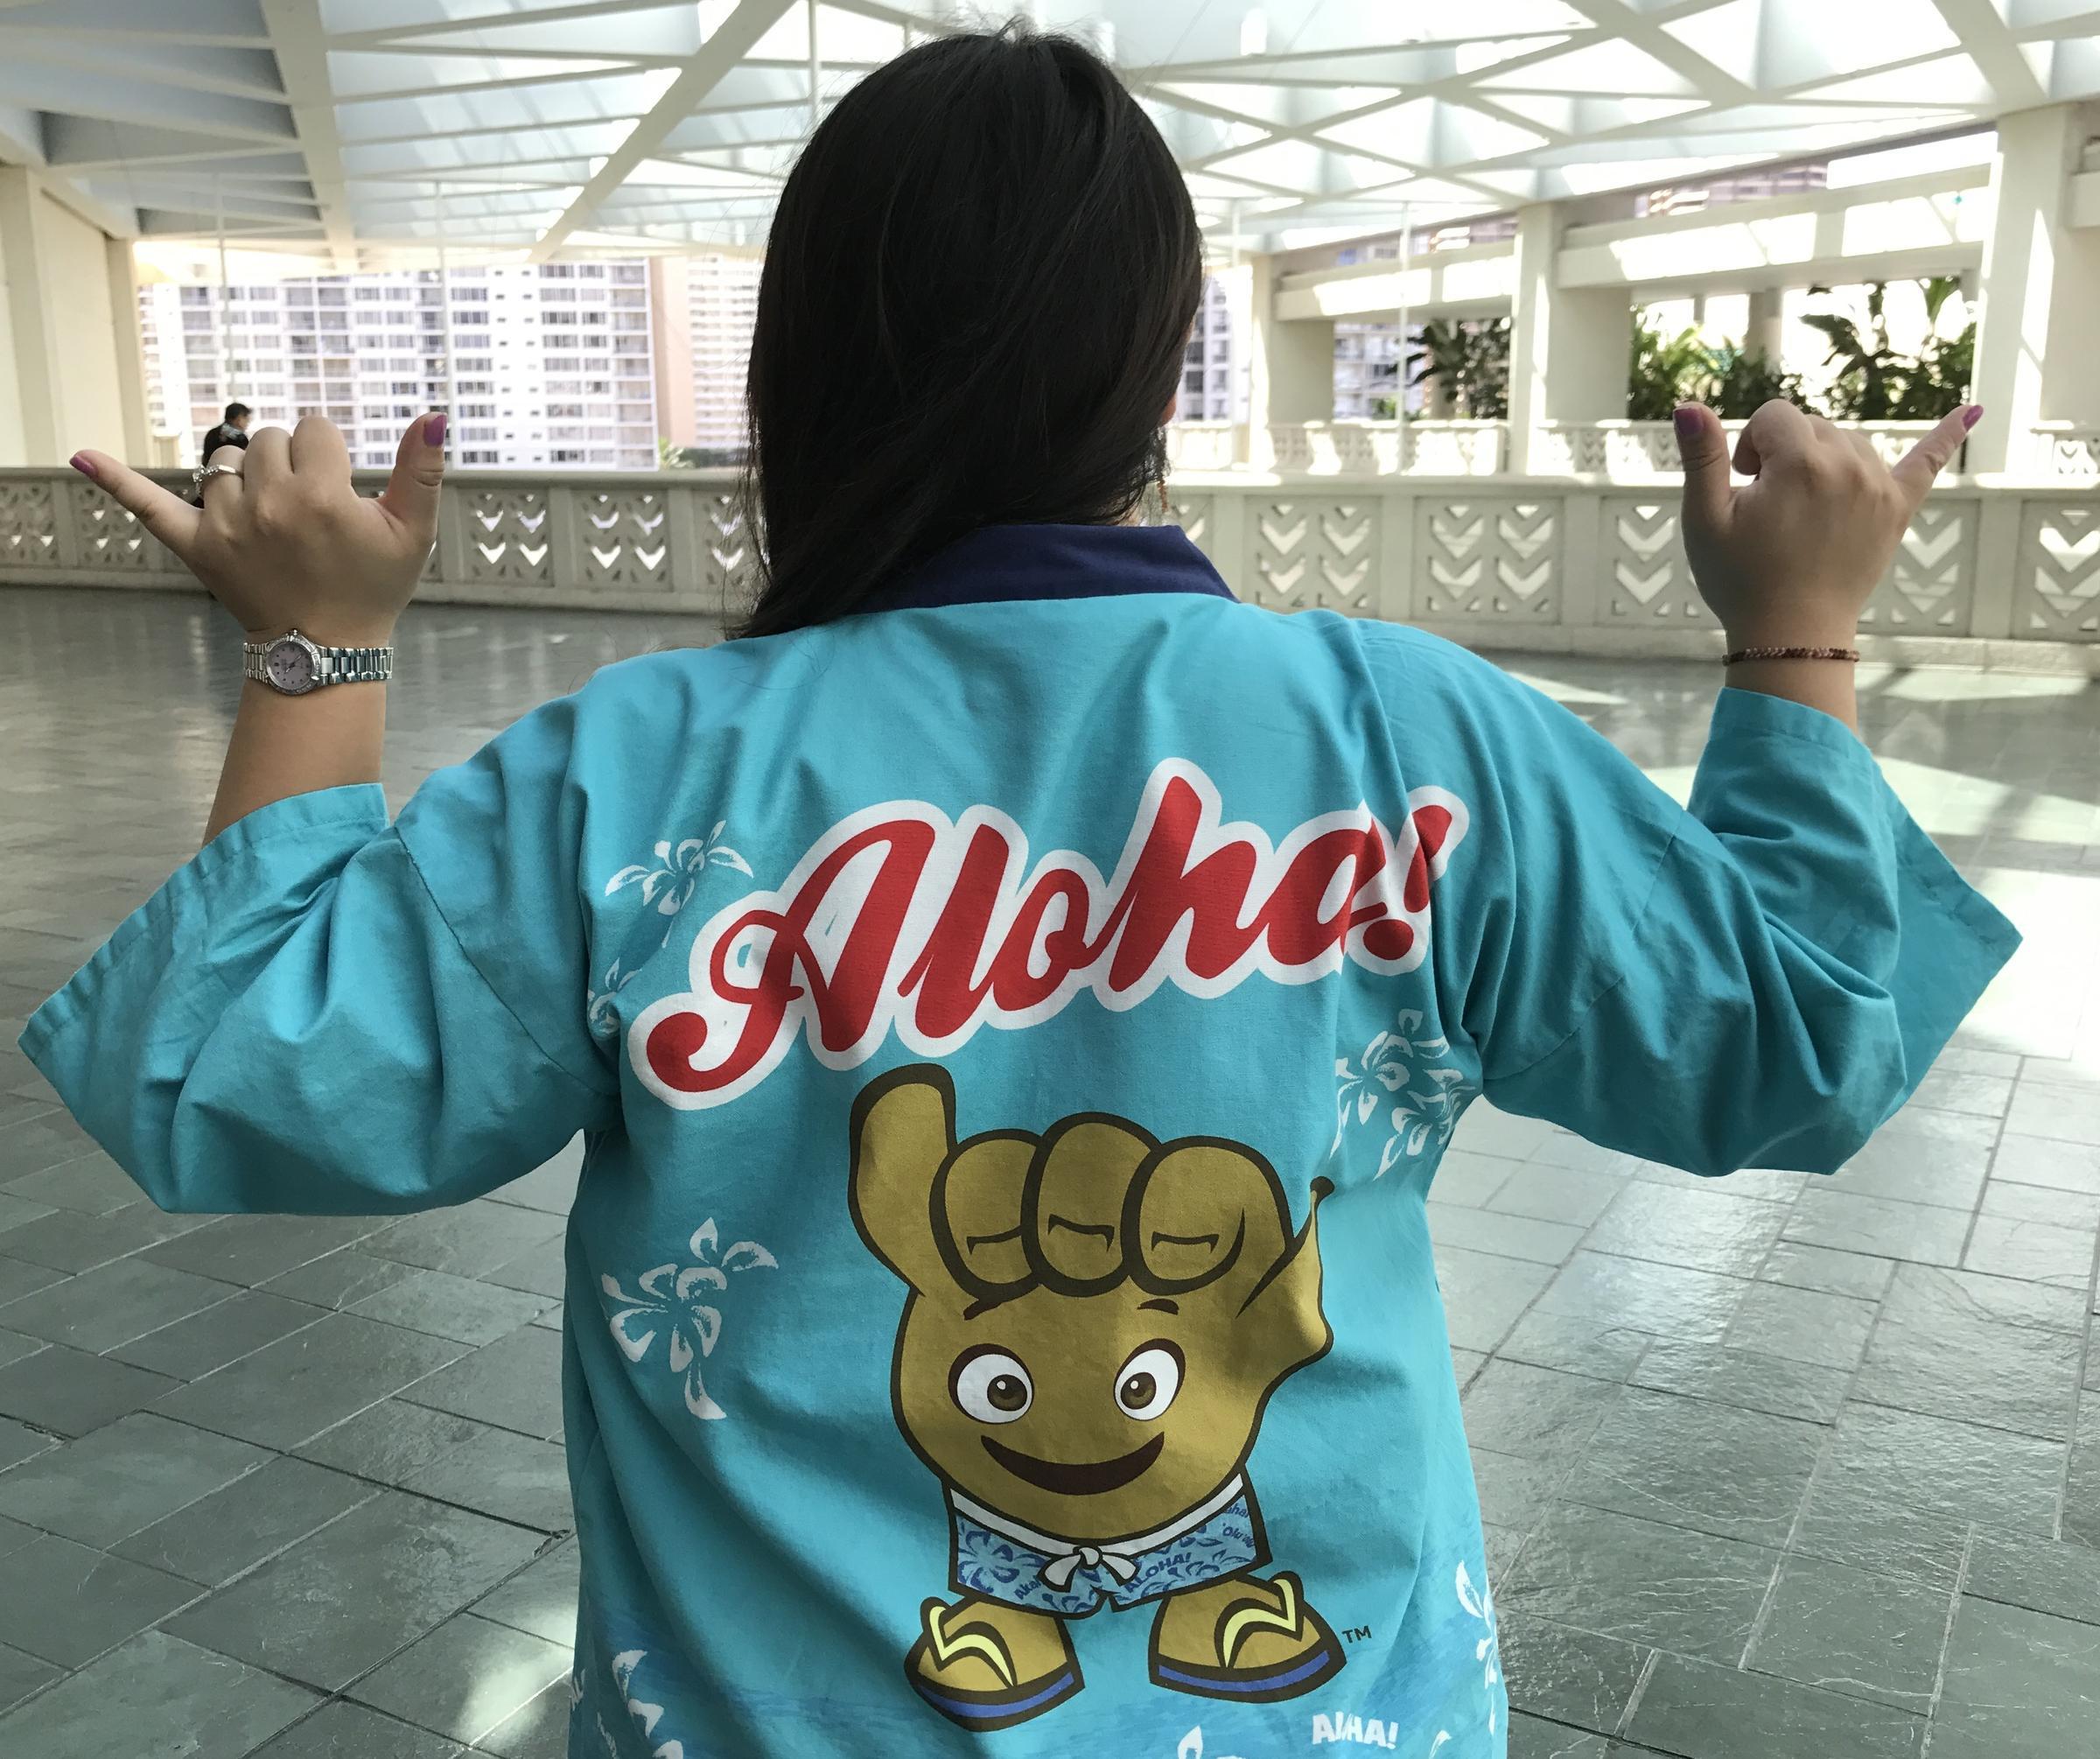 Global Tourism Summit: Japan #1 for Hawai'i | Hawaii